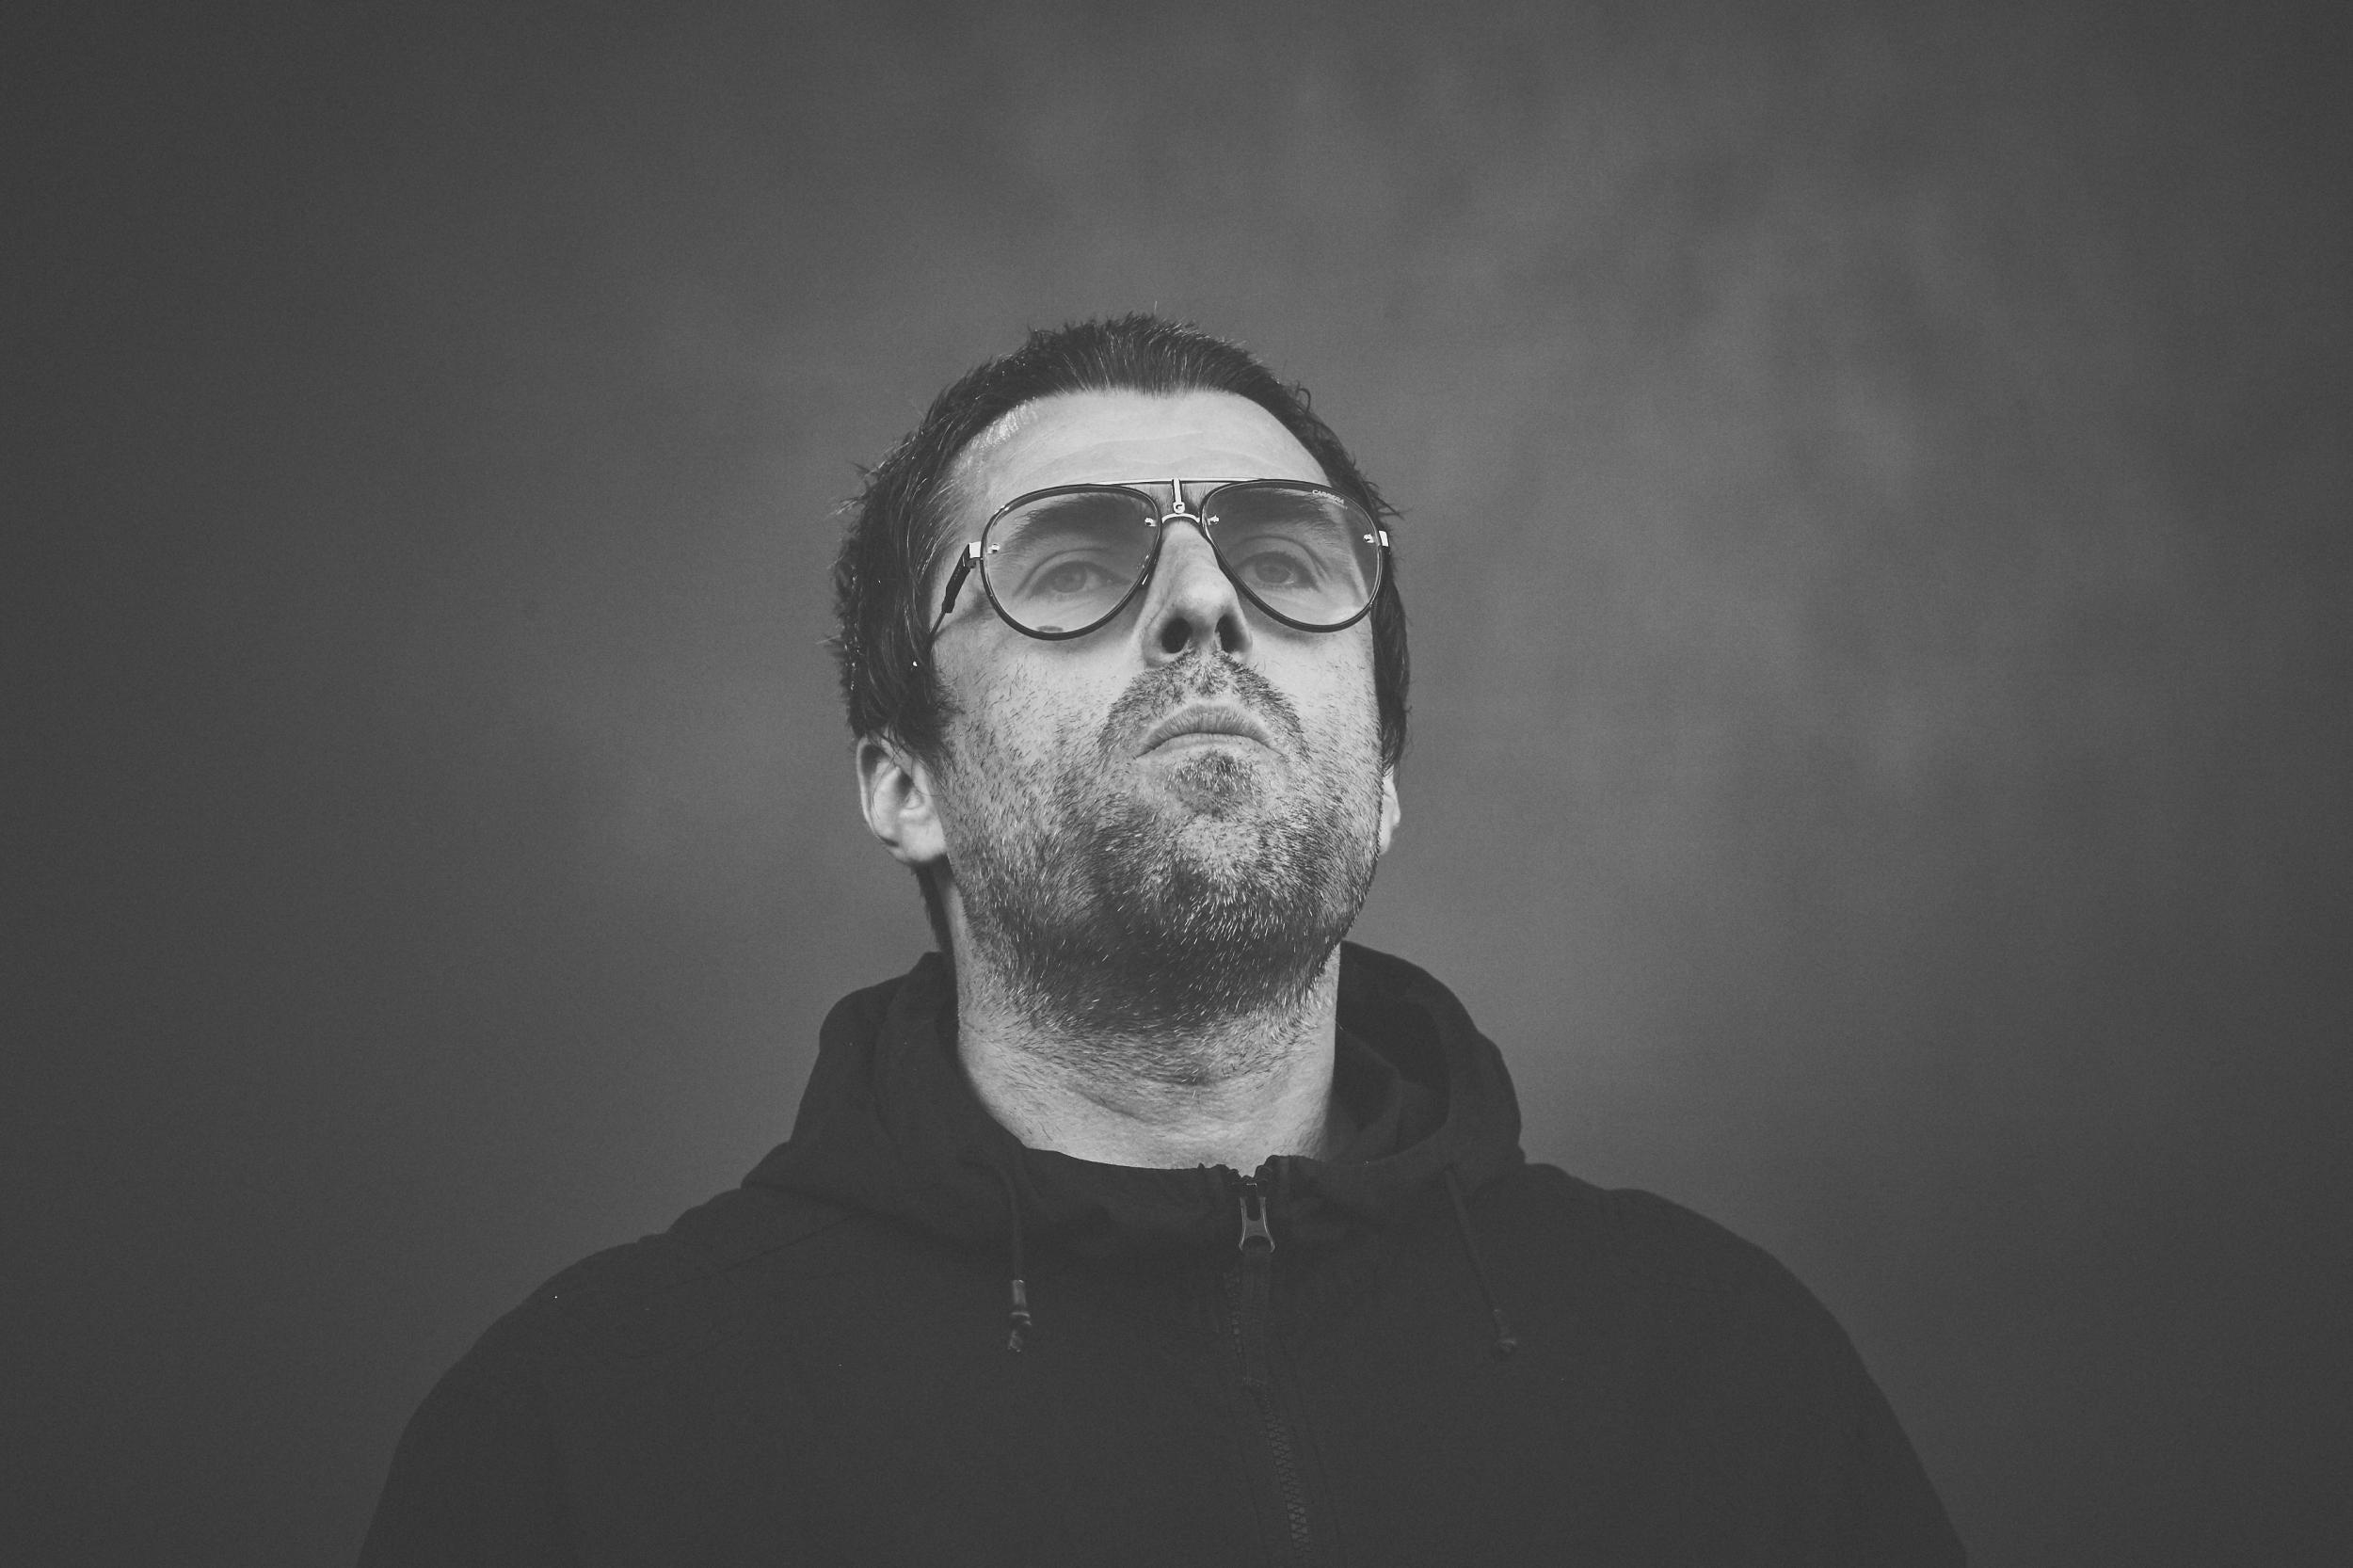 Liam Gallagher announces new album's release date